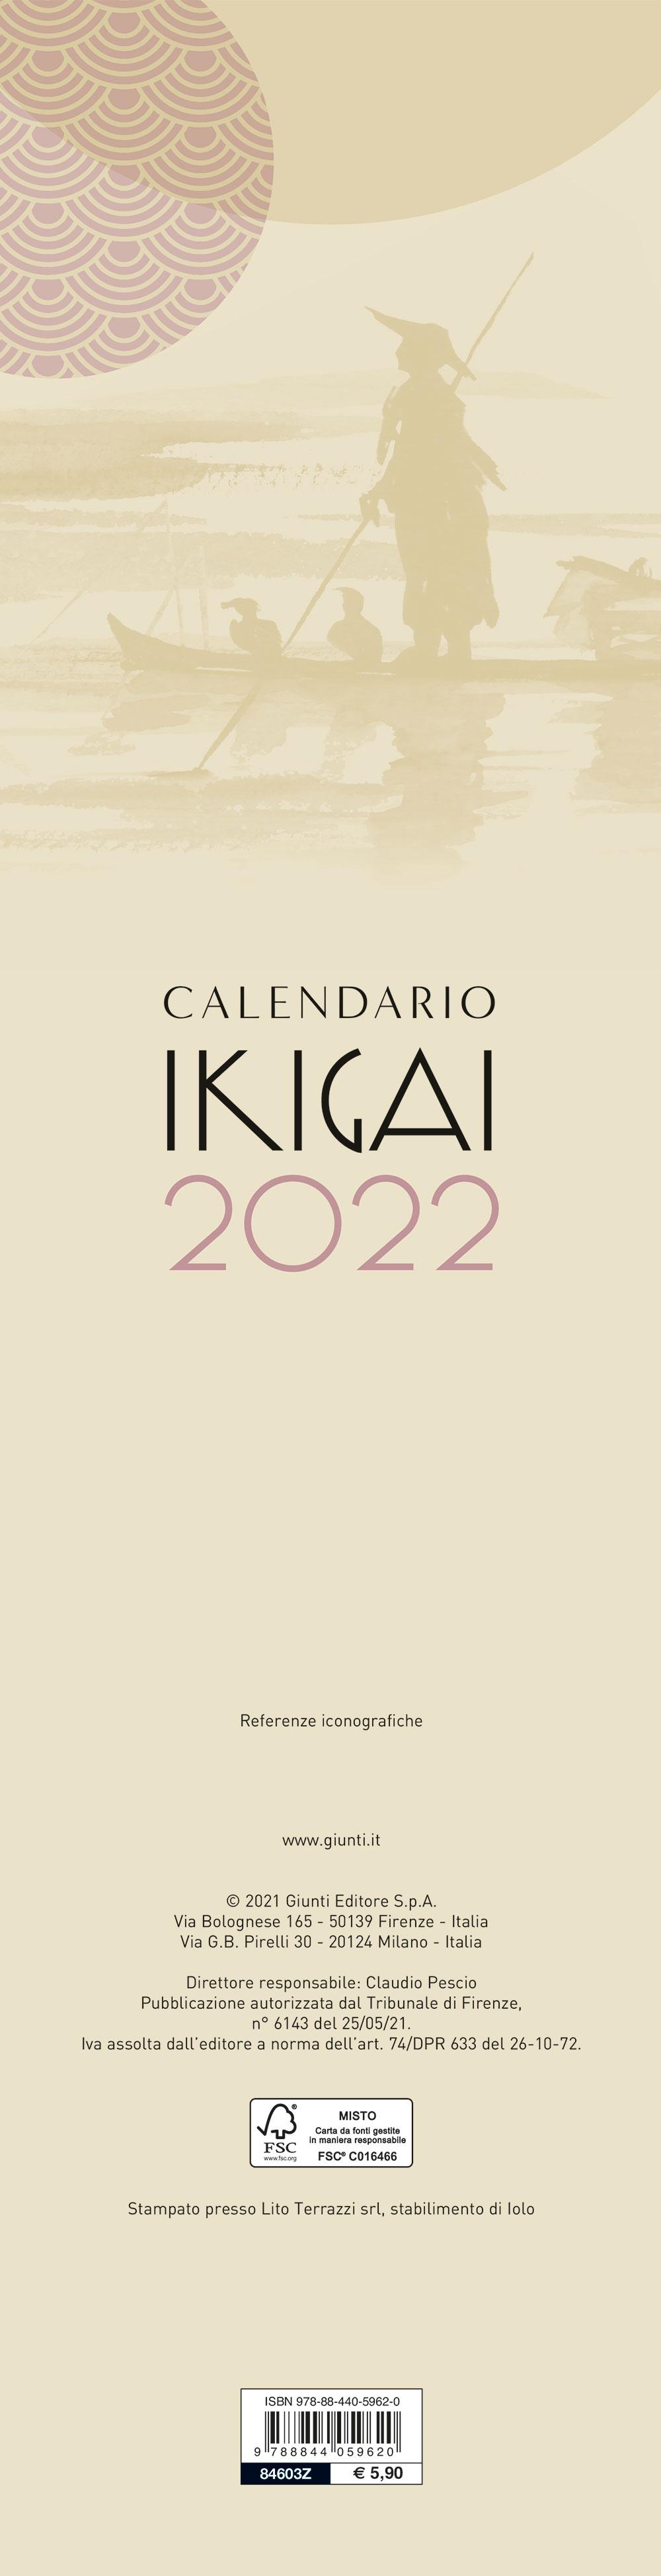 Calendario Ikigai 2022